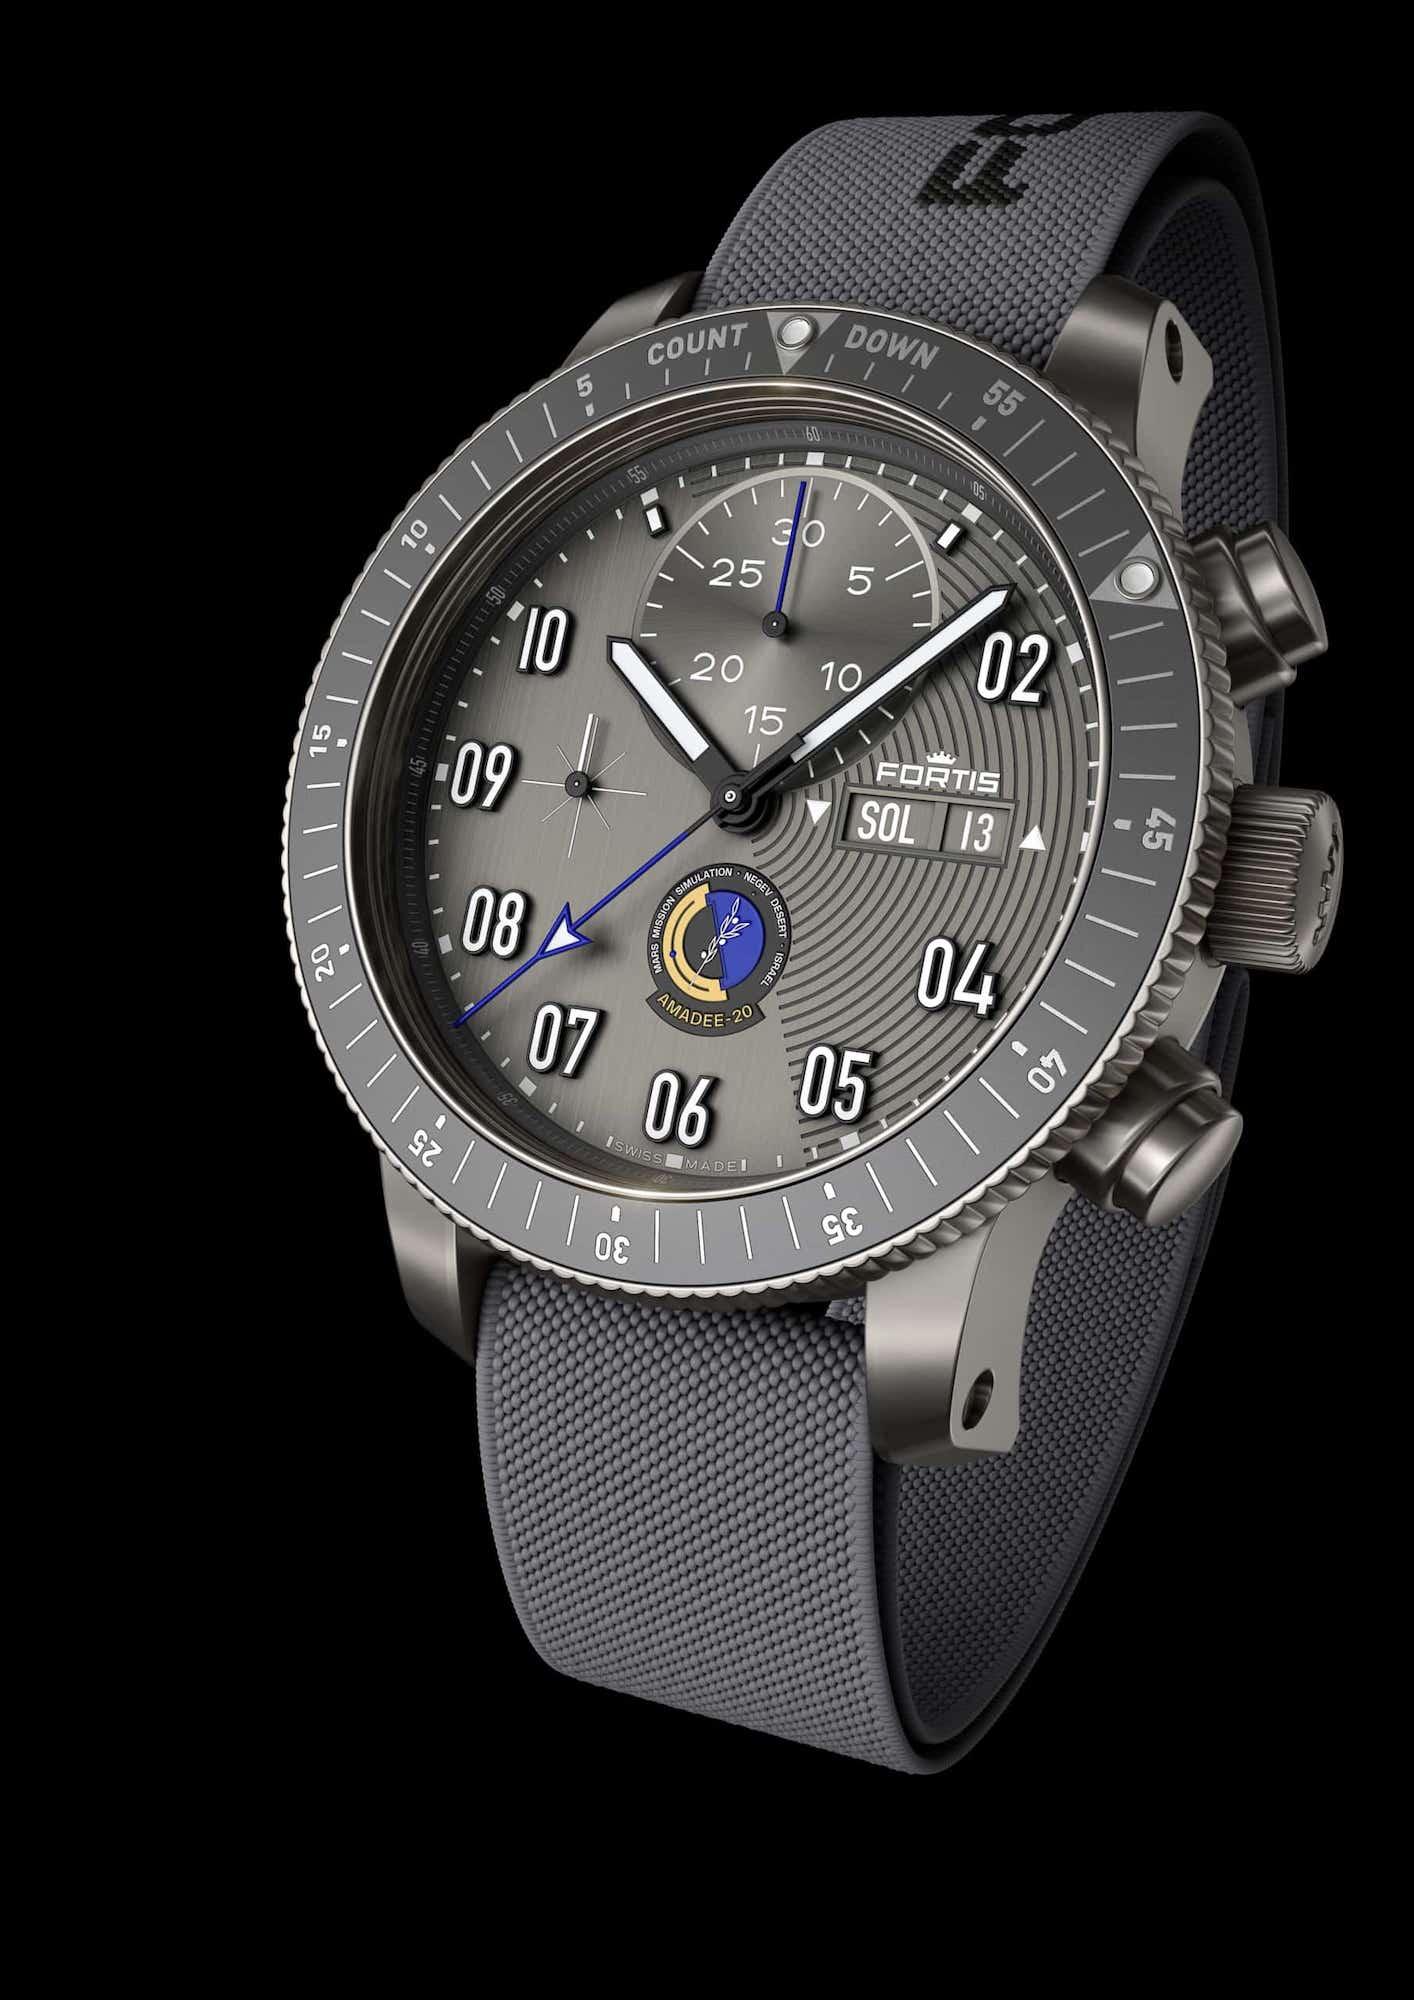 Fortis Official Cosmonauts Chronograph AMADEE-20 Esfera